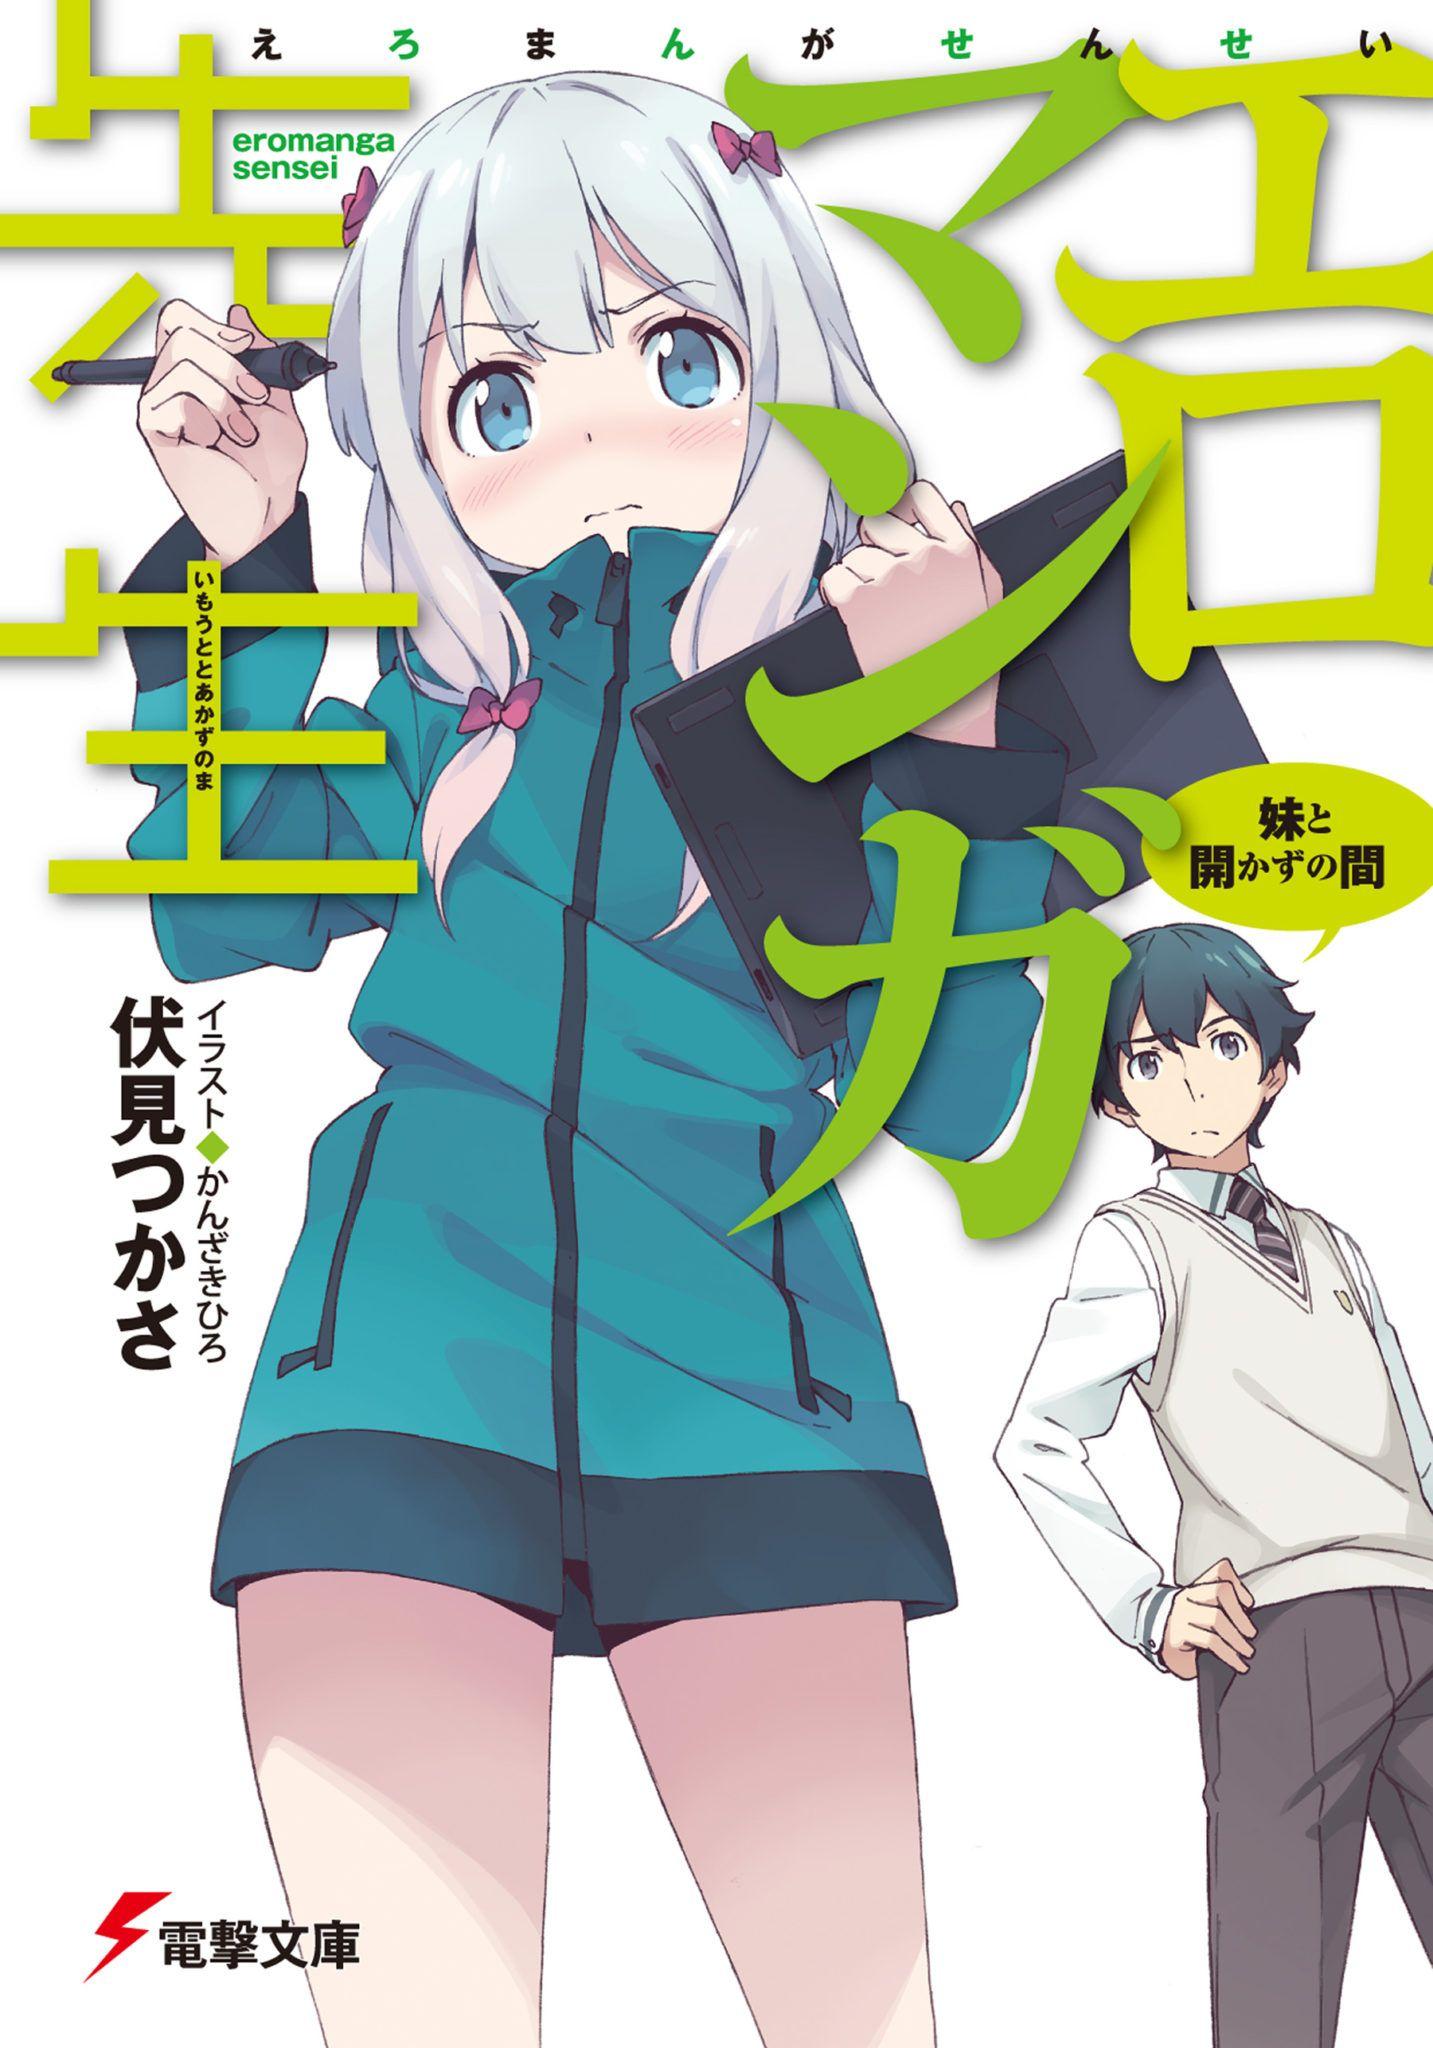 Ero Manga Sensei novel 1